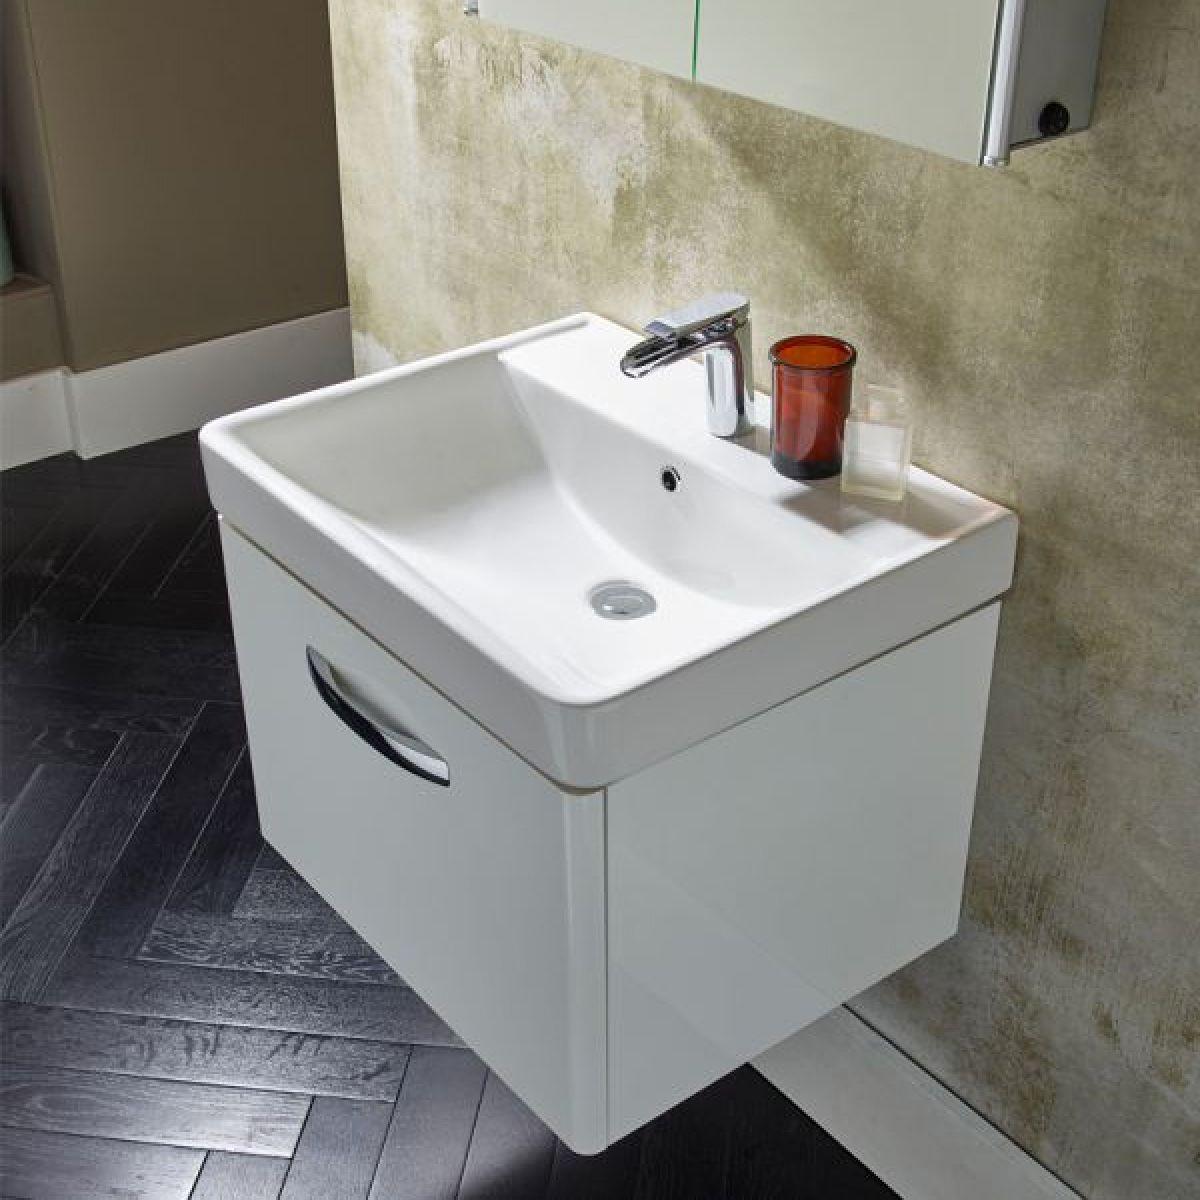 Tavistock Compass Gloss White Wall Mounted Vanity Unit 600mm Basin